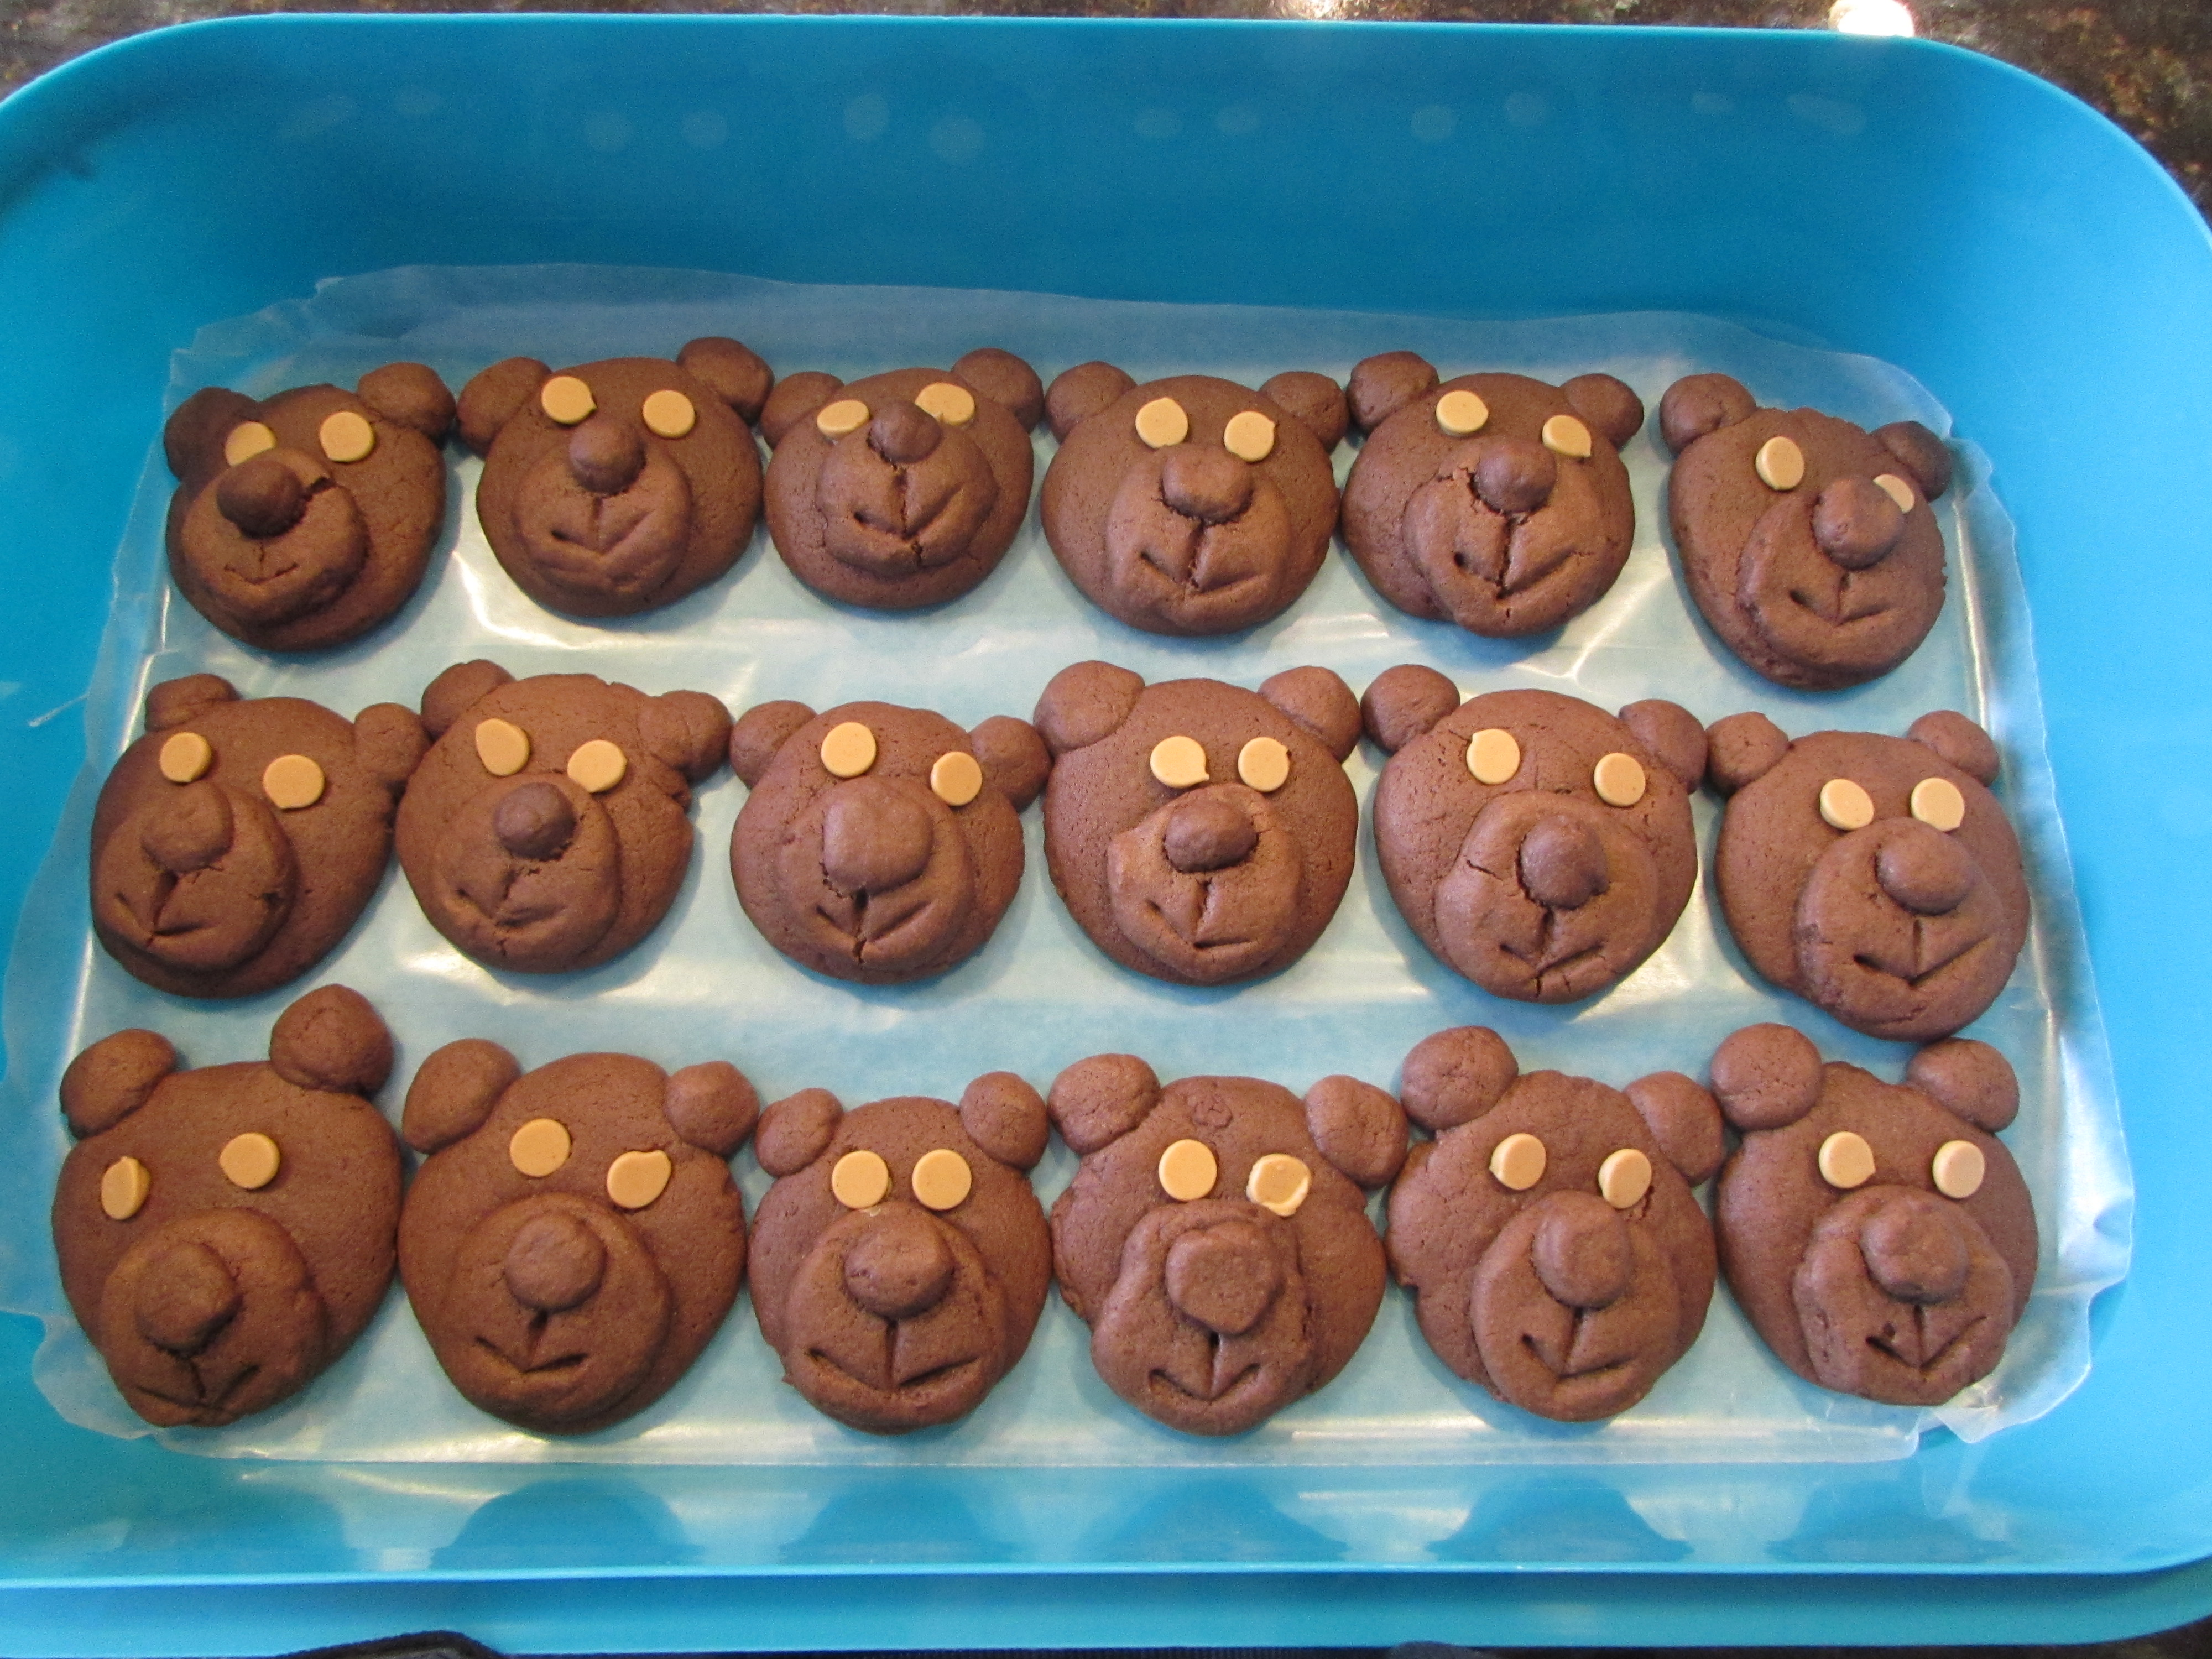 Chocolate Teddy Bear Cookies whistletoes